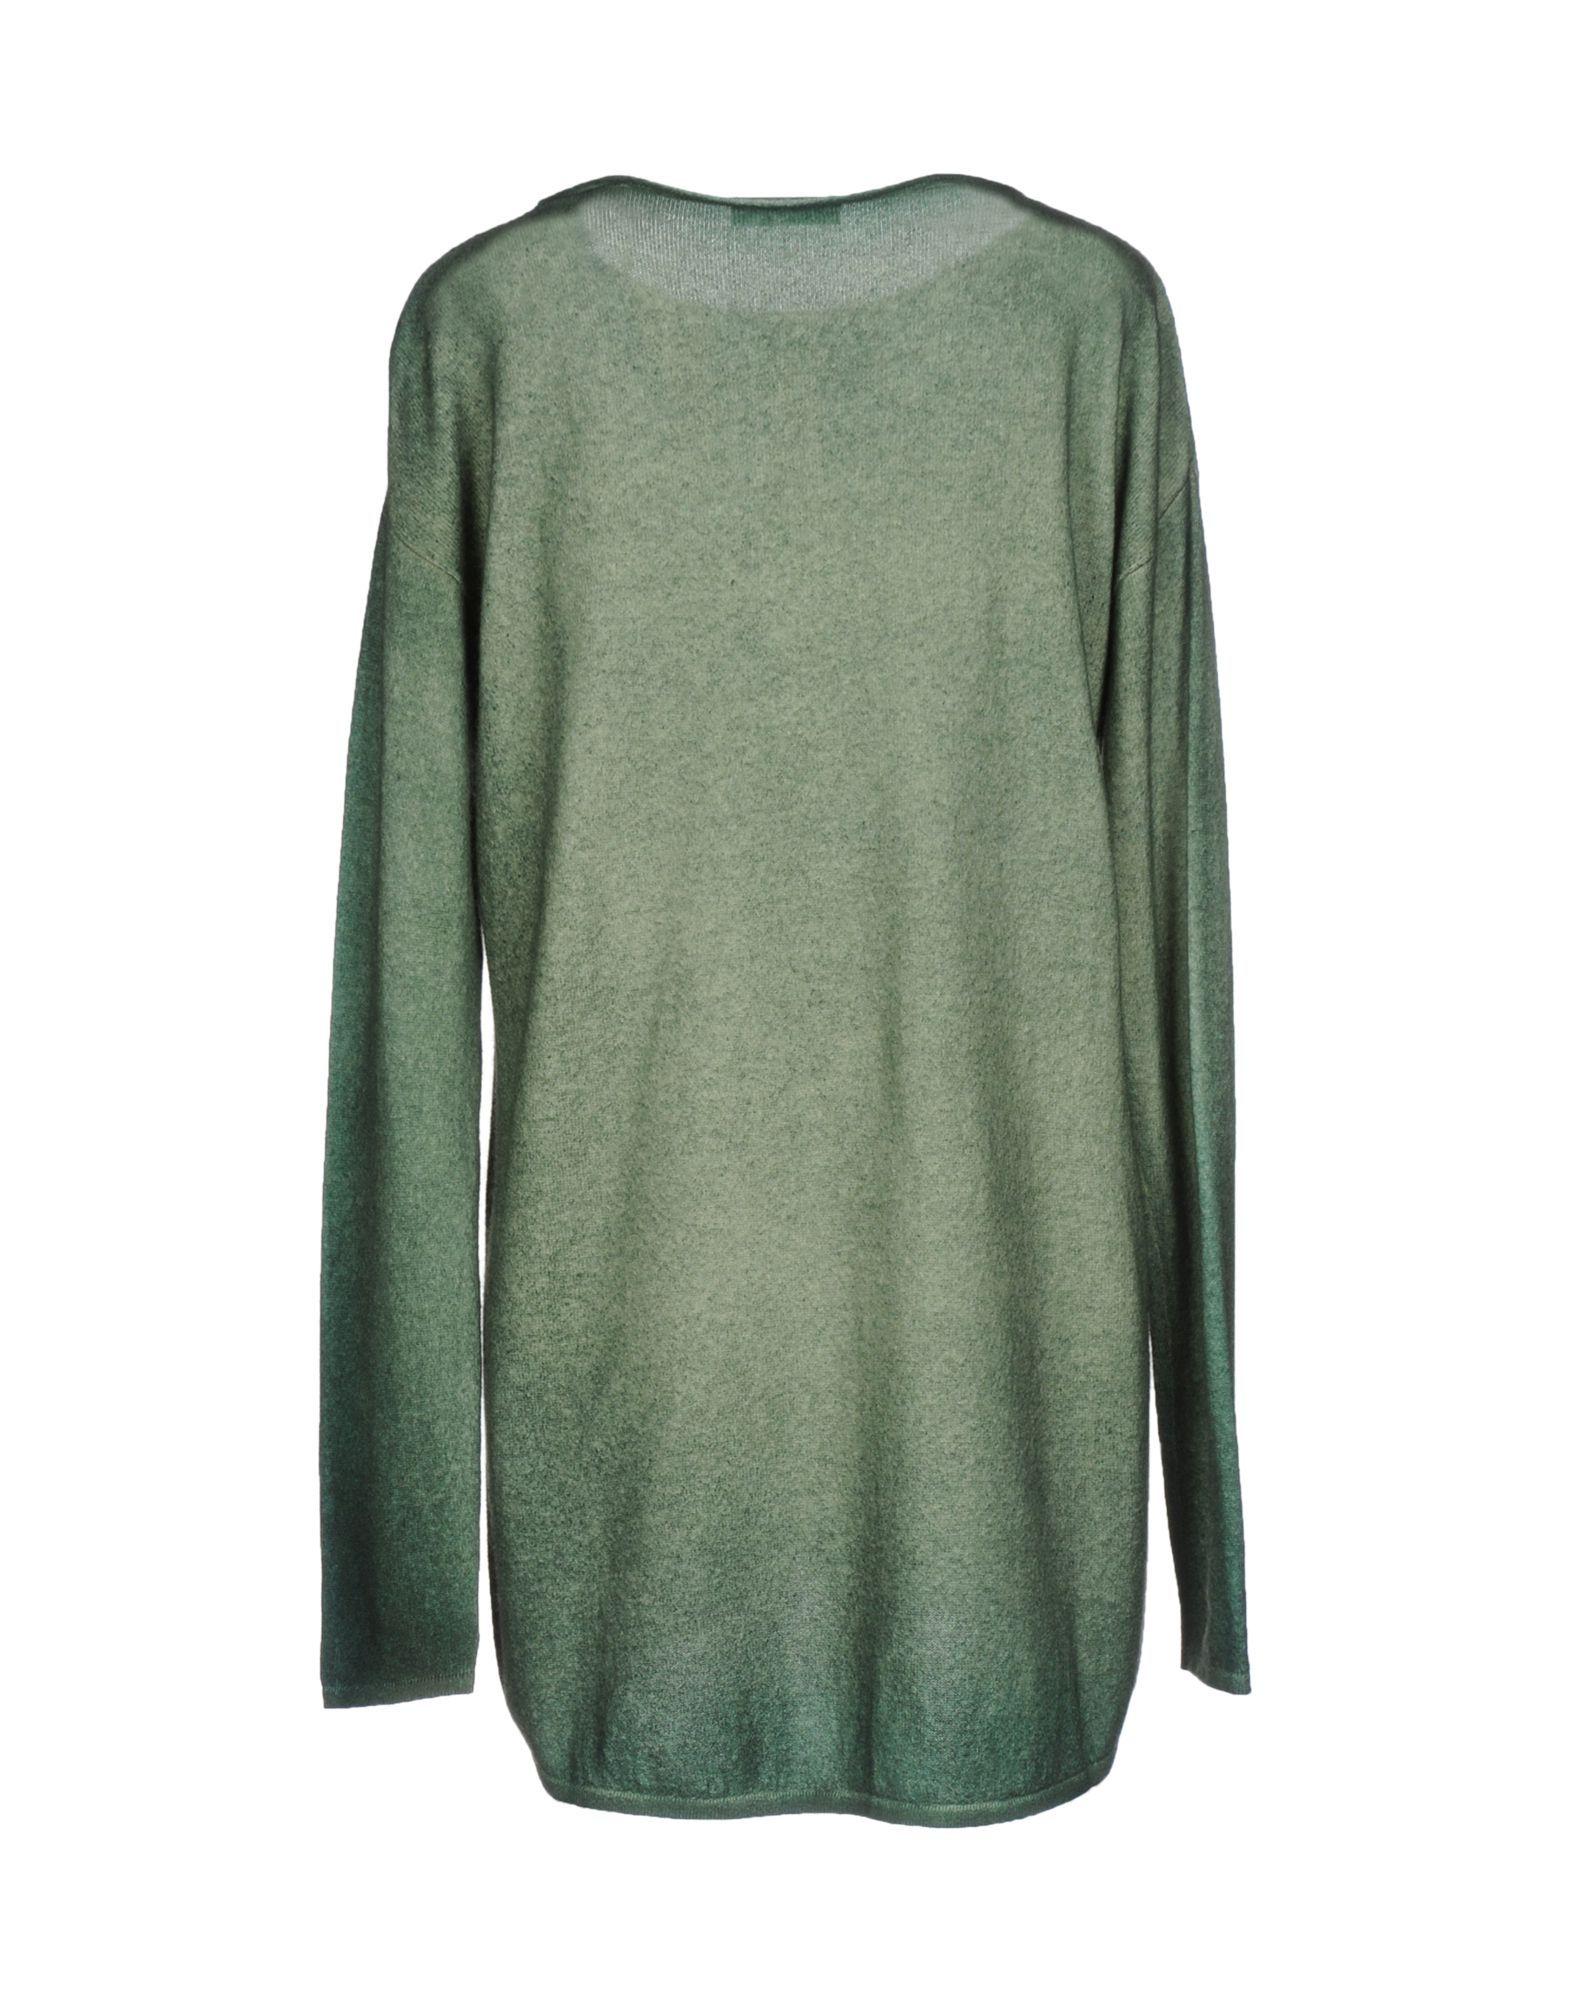 Knitwear Aragona Green Women's Lana Geelong